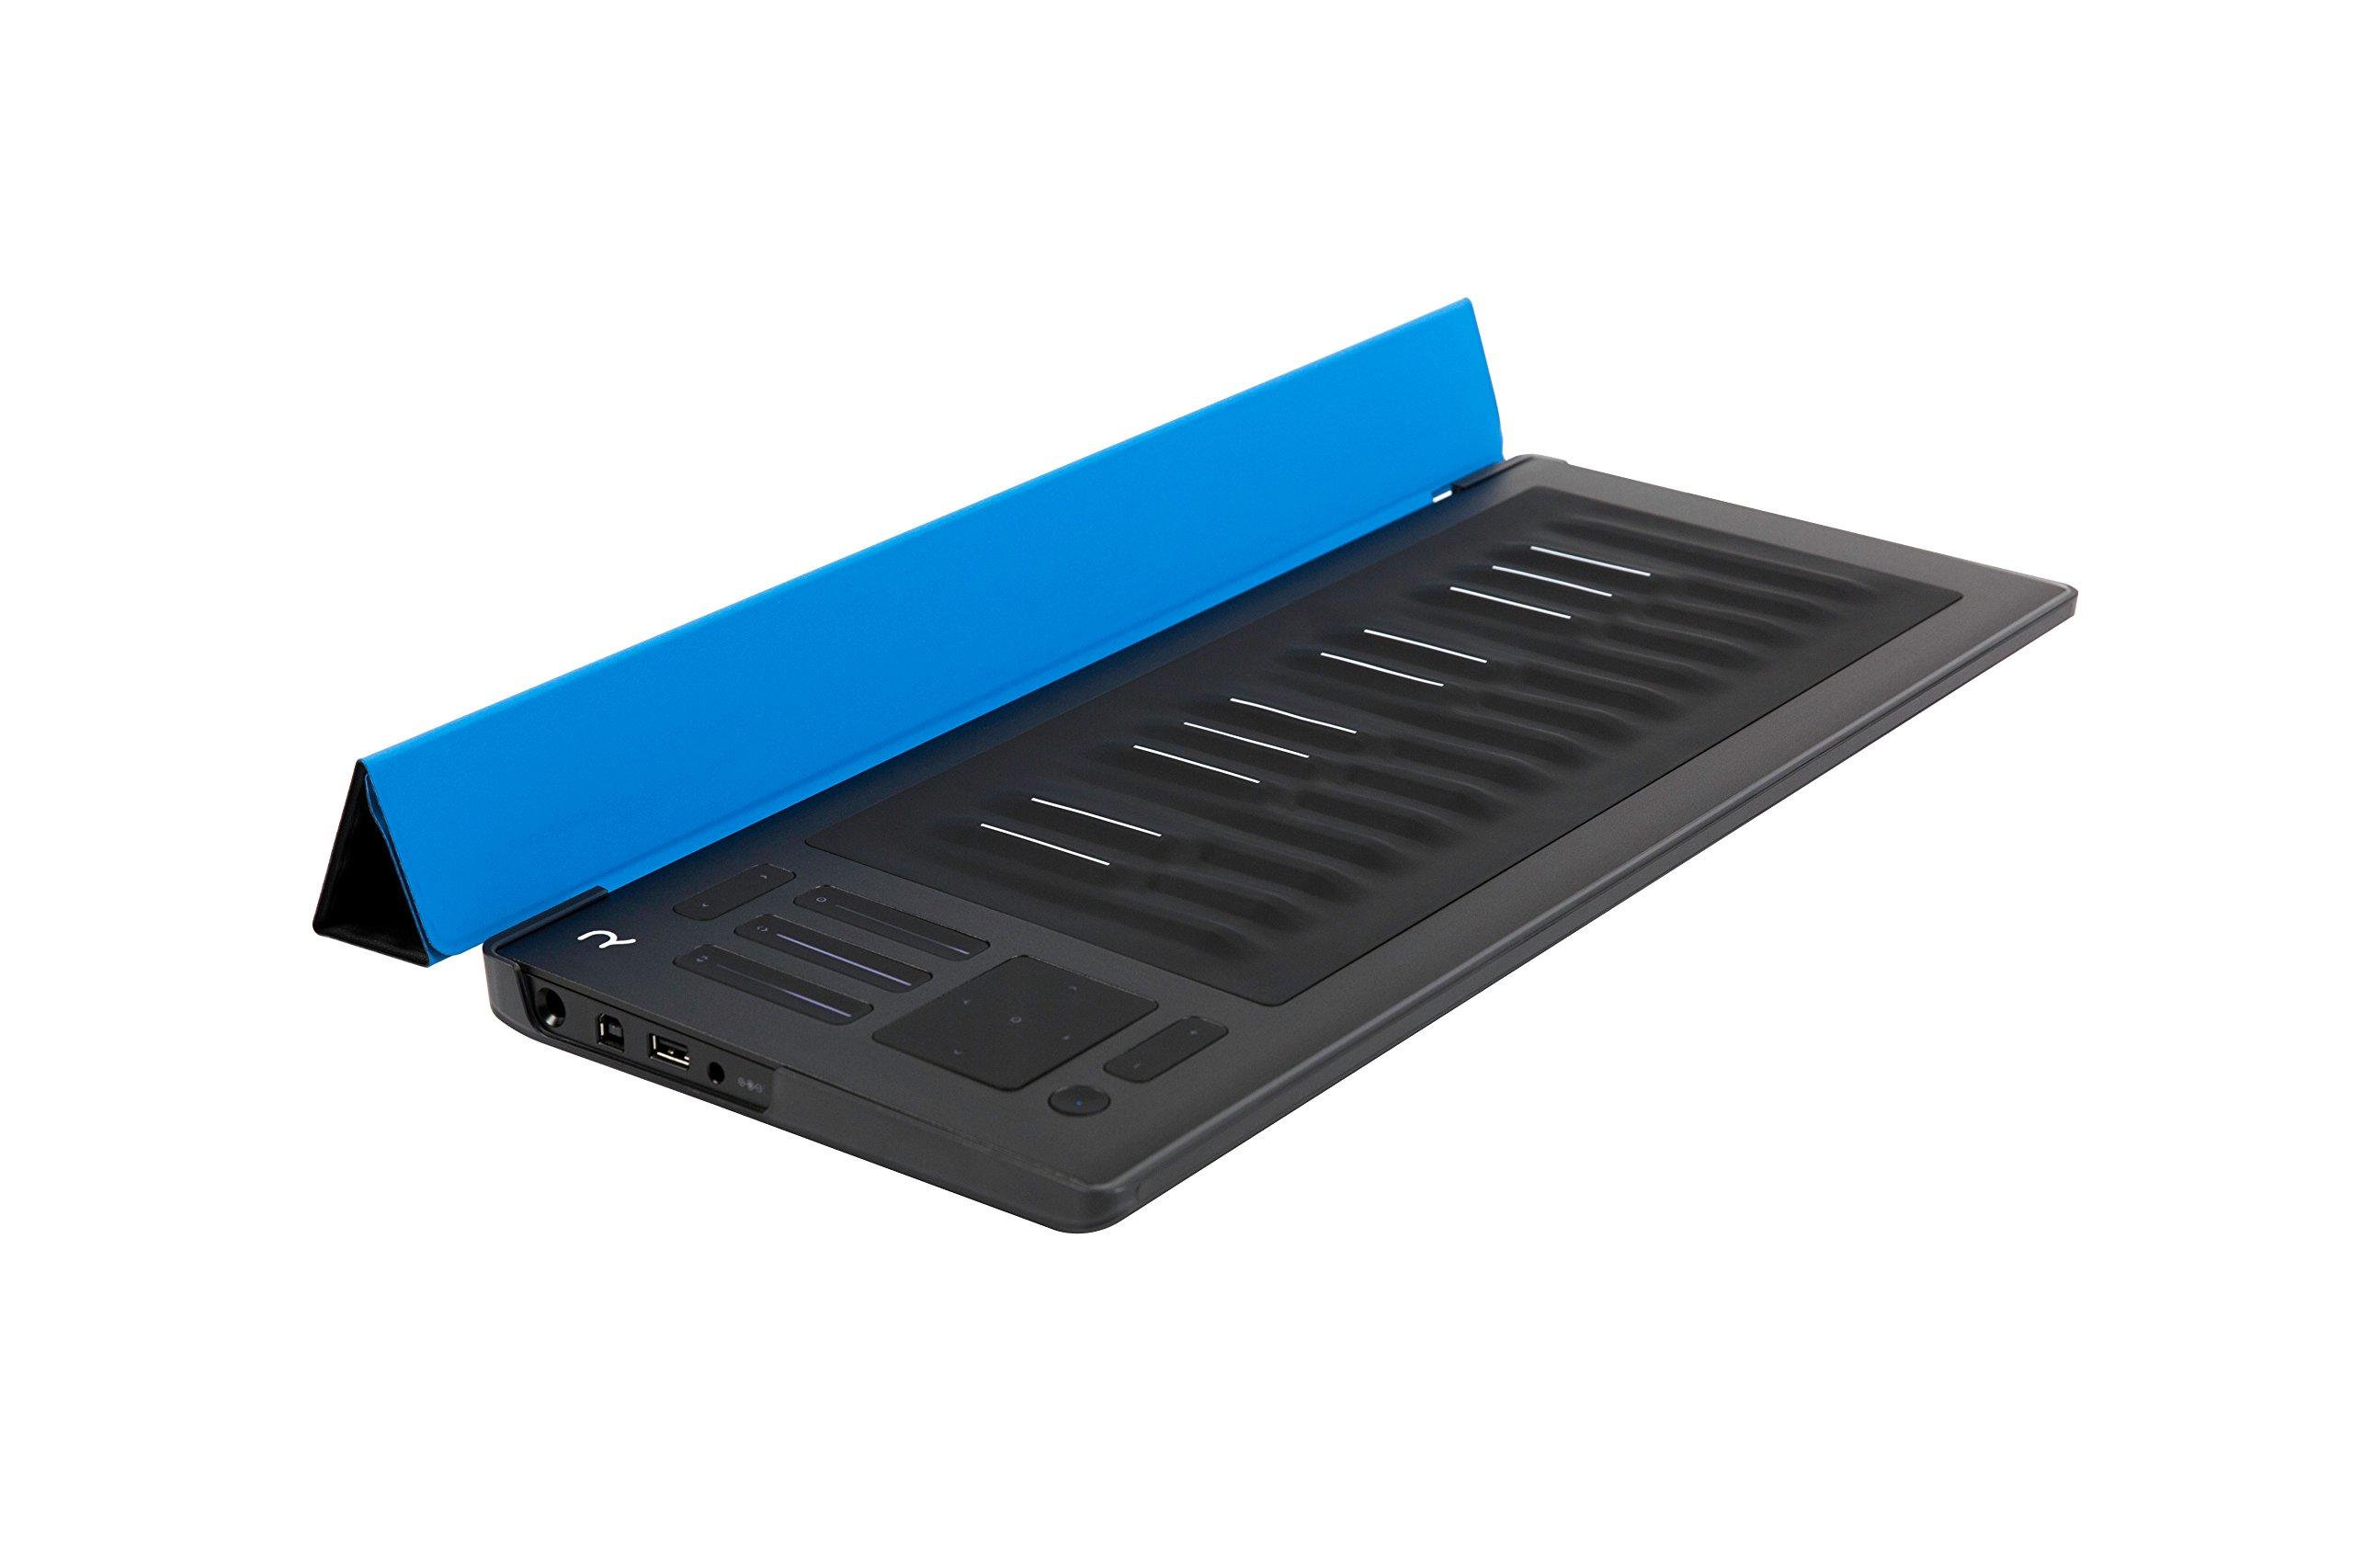 ROLI Seaboard RISE 25 MIDI Controller with Flip Case in Sky Blue